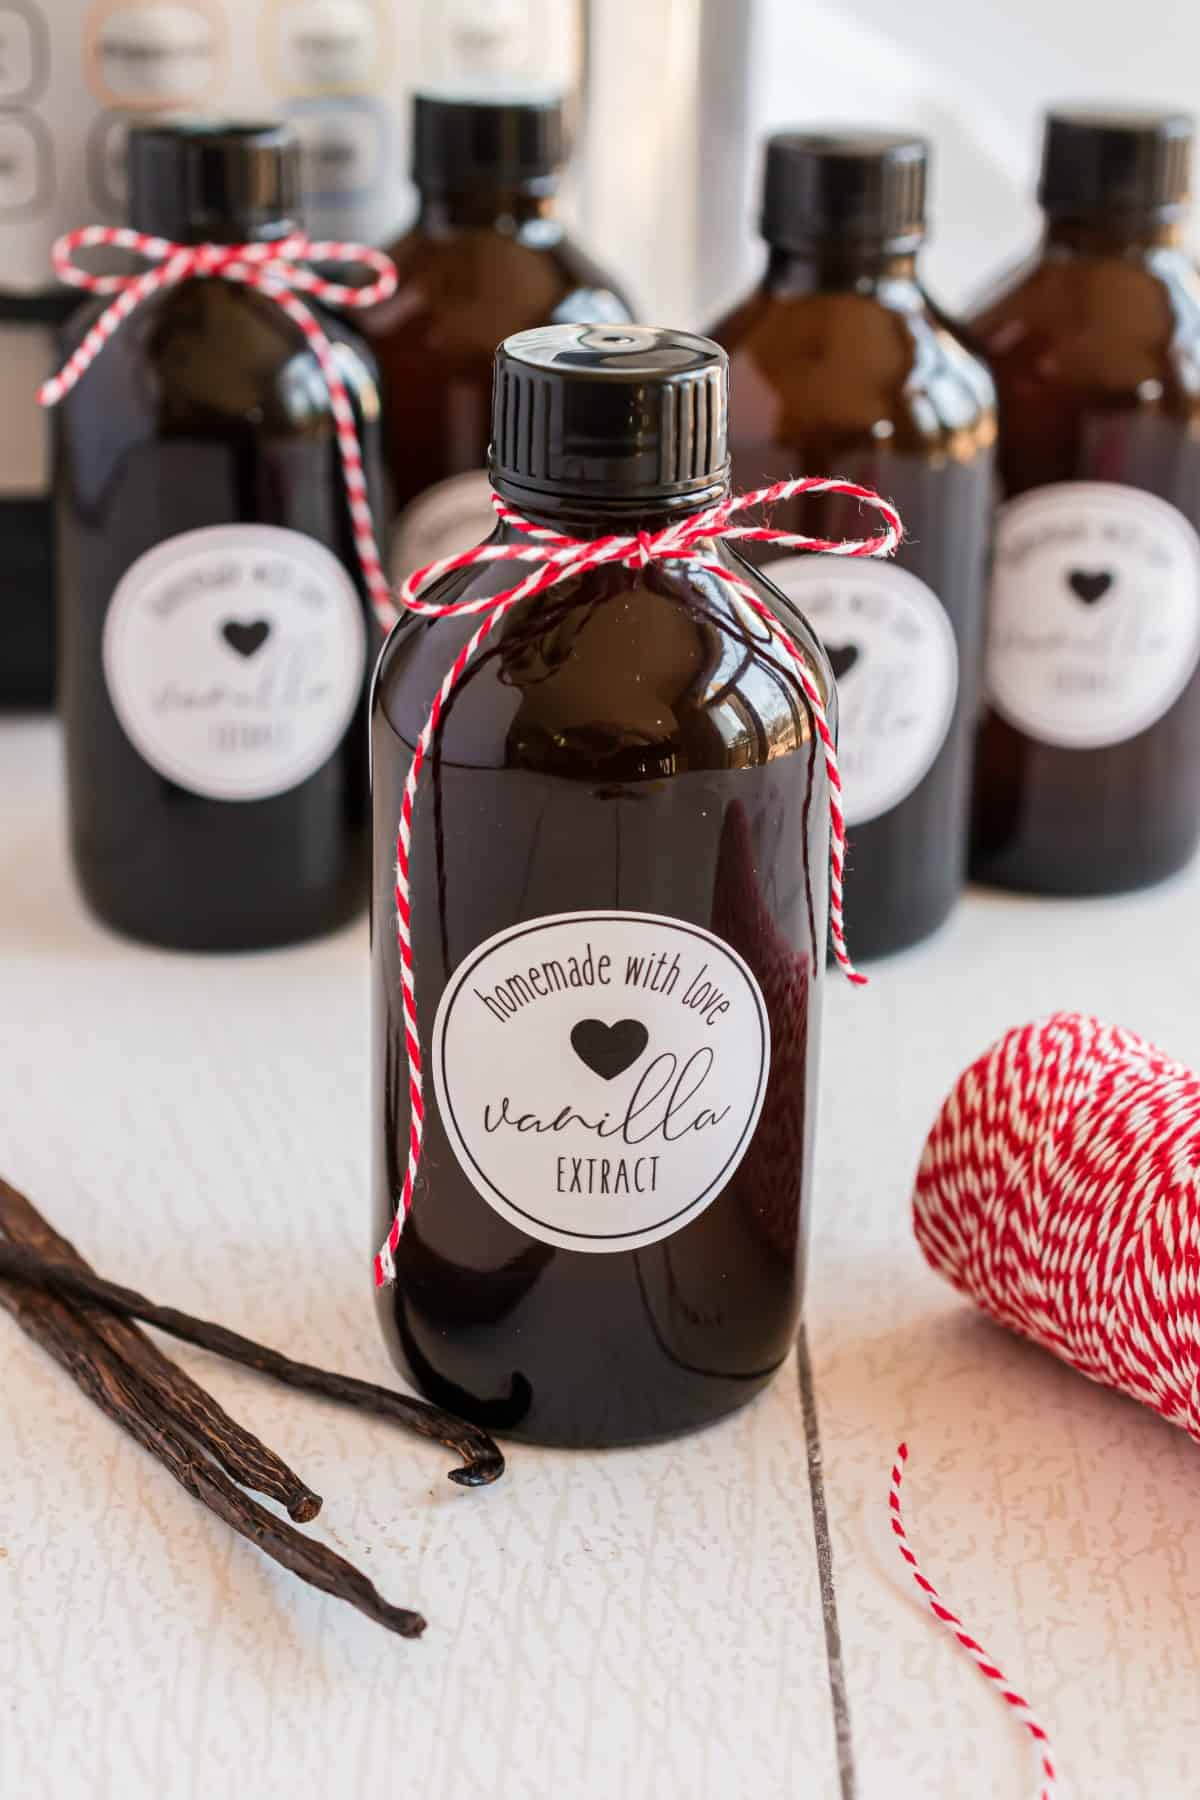 Homemade Vanilla Extract in glass bottles.